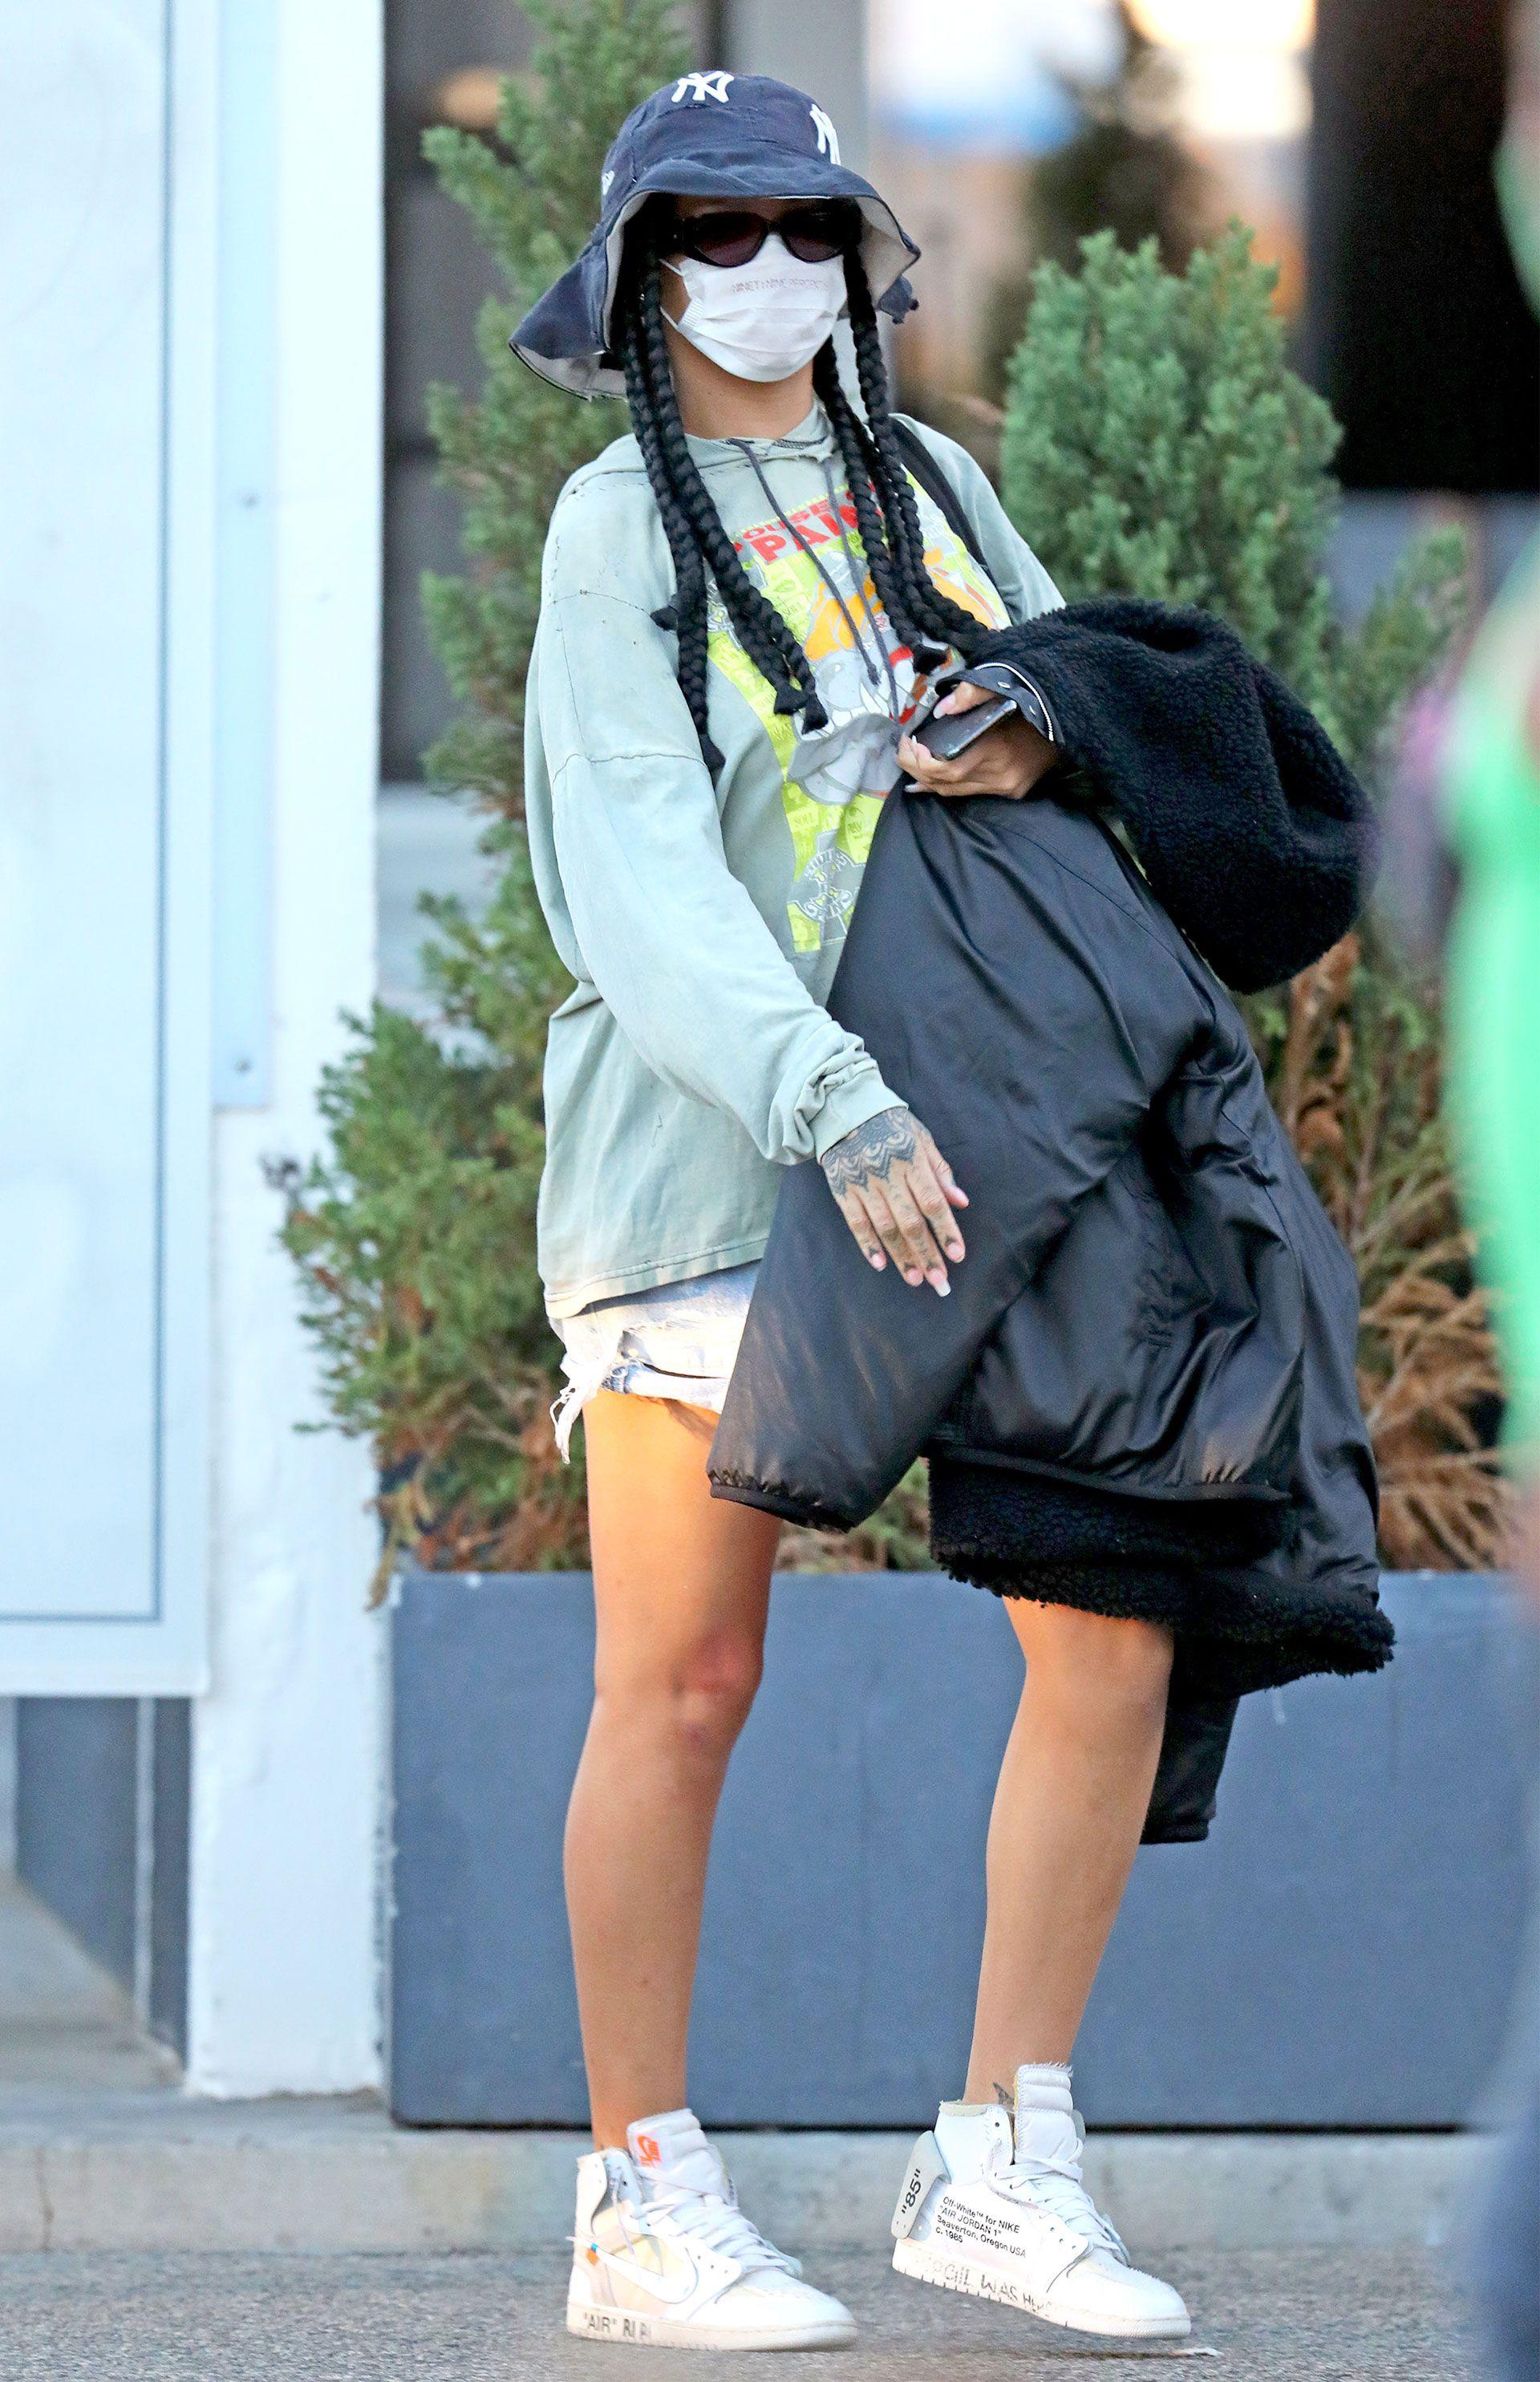 Celebrities-en-un-clic-Rihanna-24092020